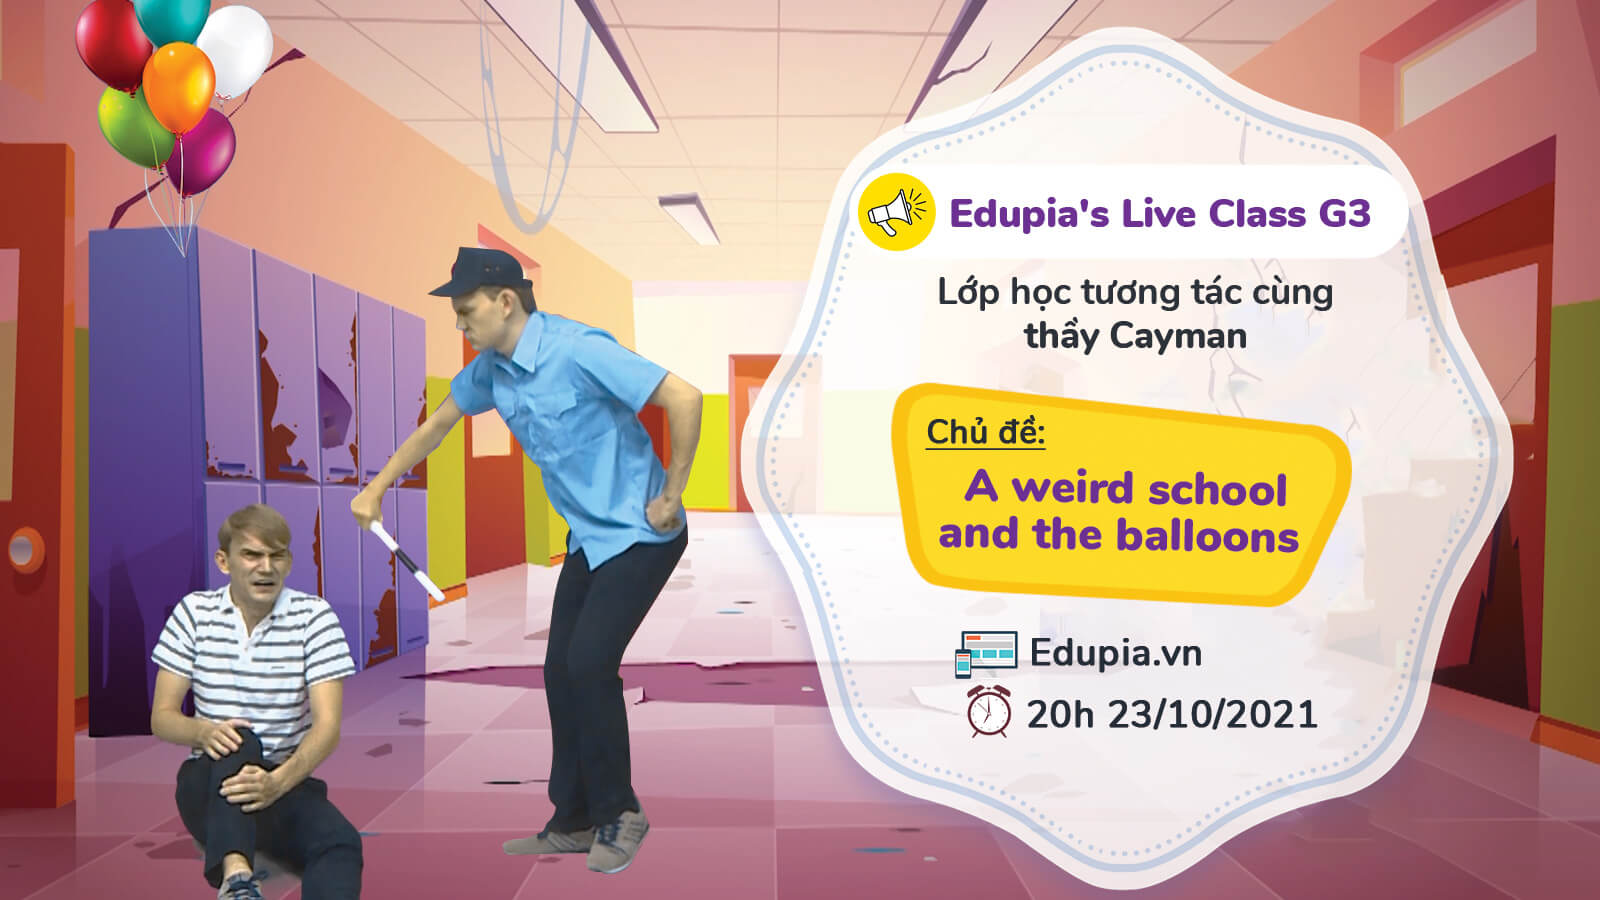 A weird school and the balloons